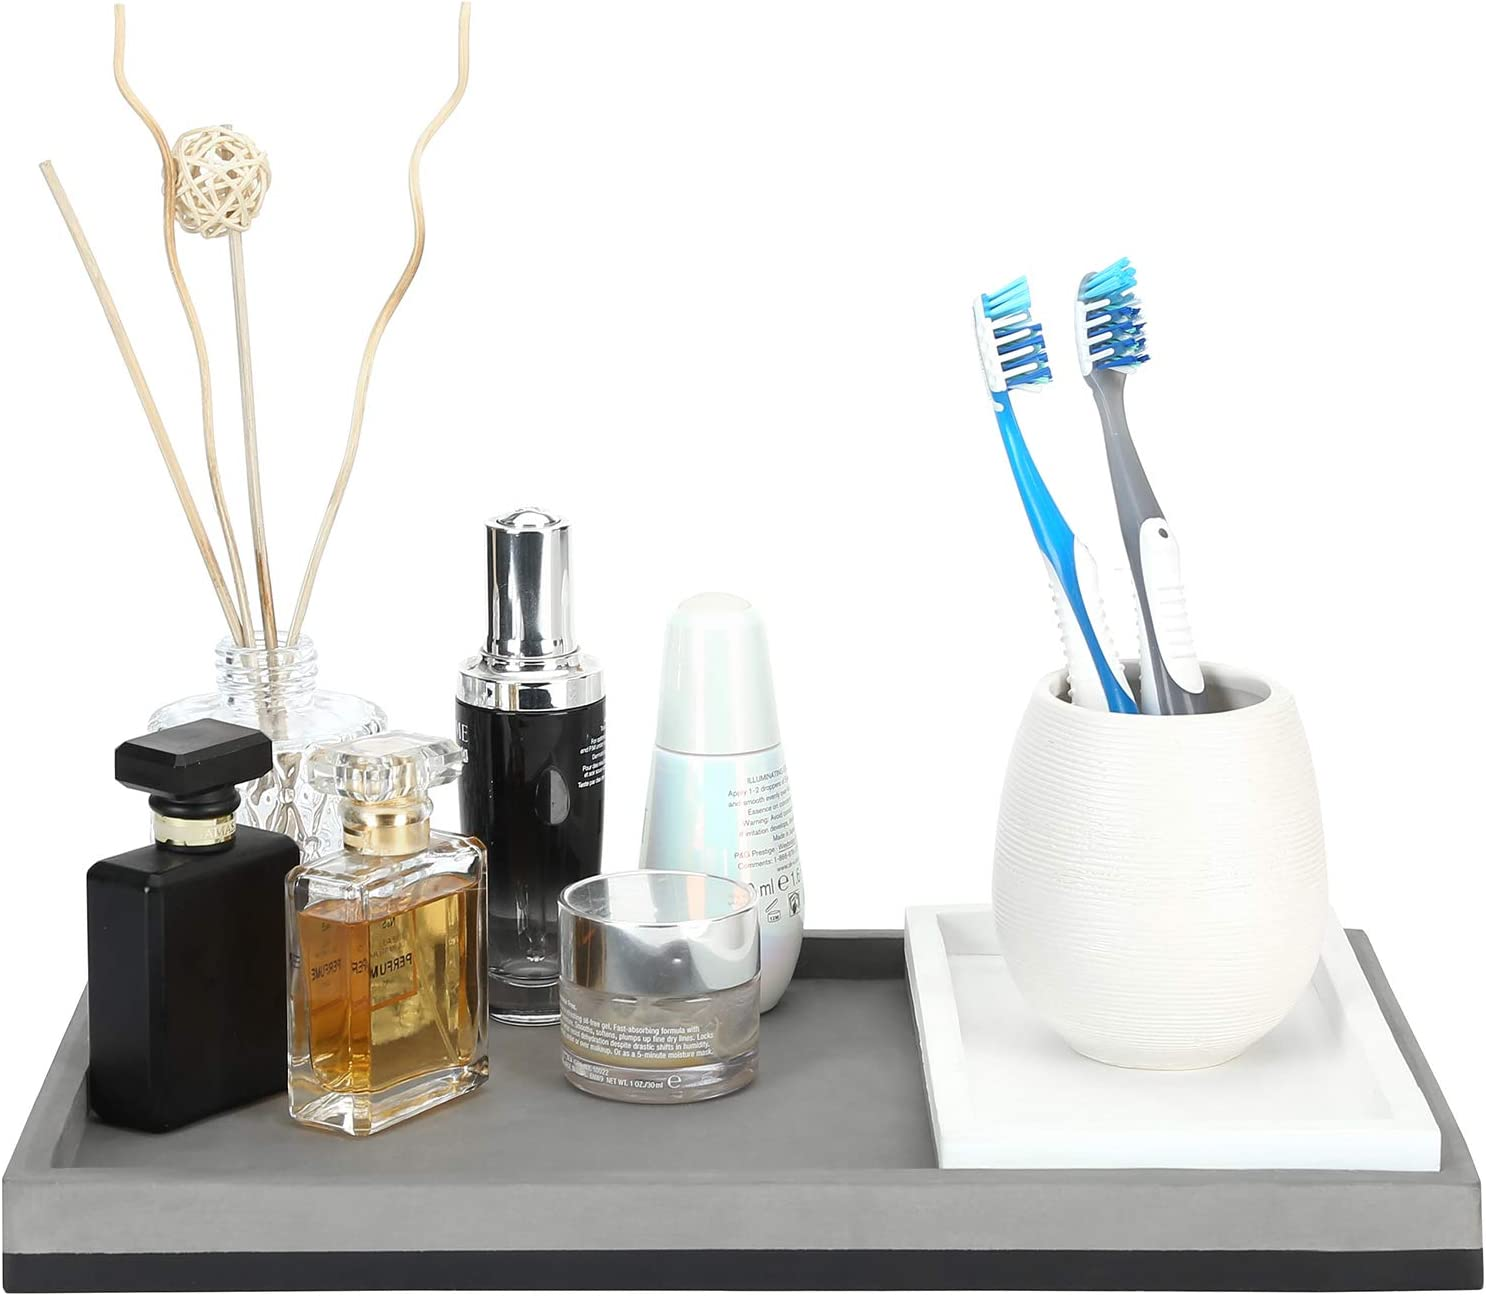 MyGift Modern Mixed Tone Concrete Vanity Bathroom Organizer Tray, Decorative Serving Platter, Gray & White